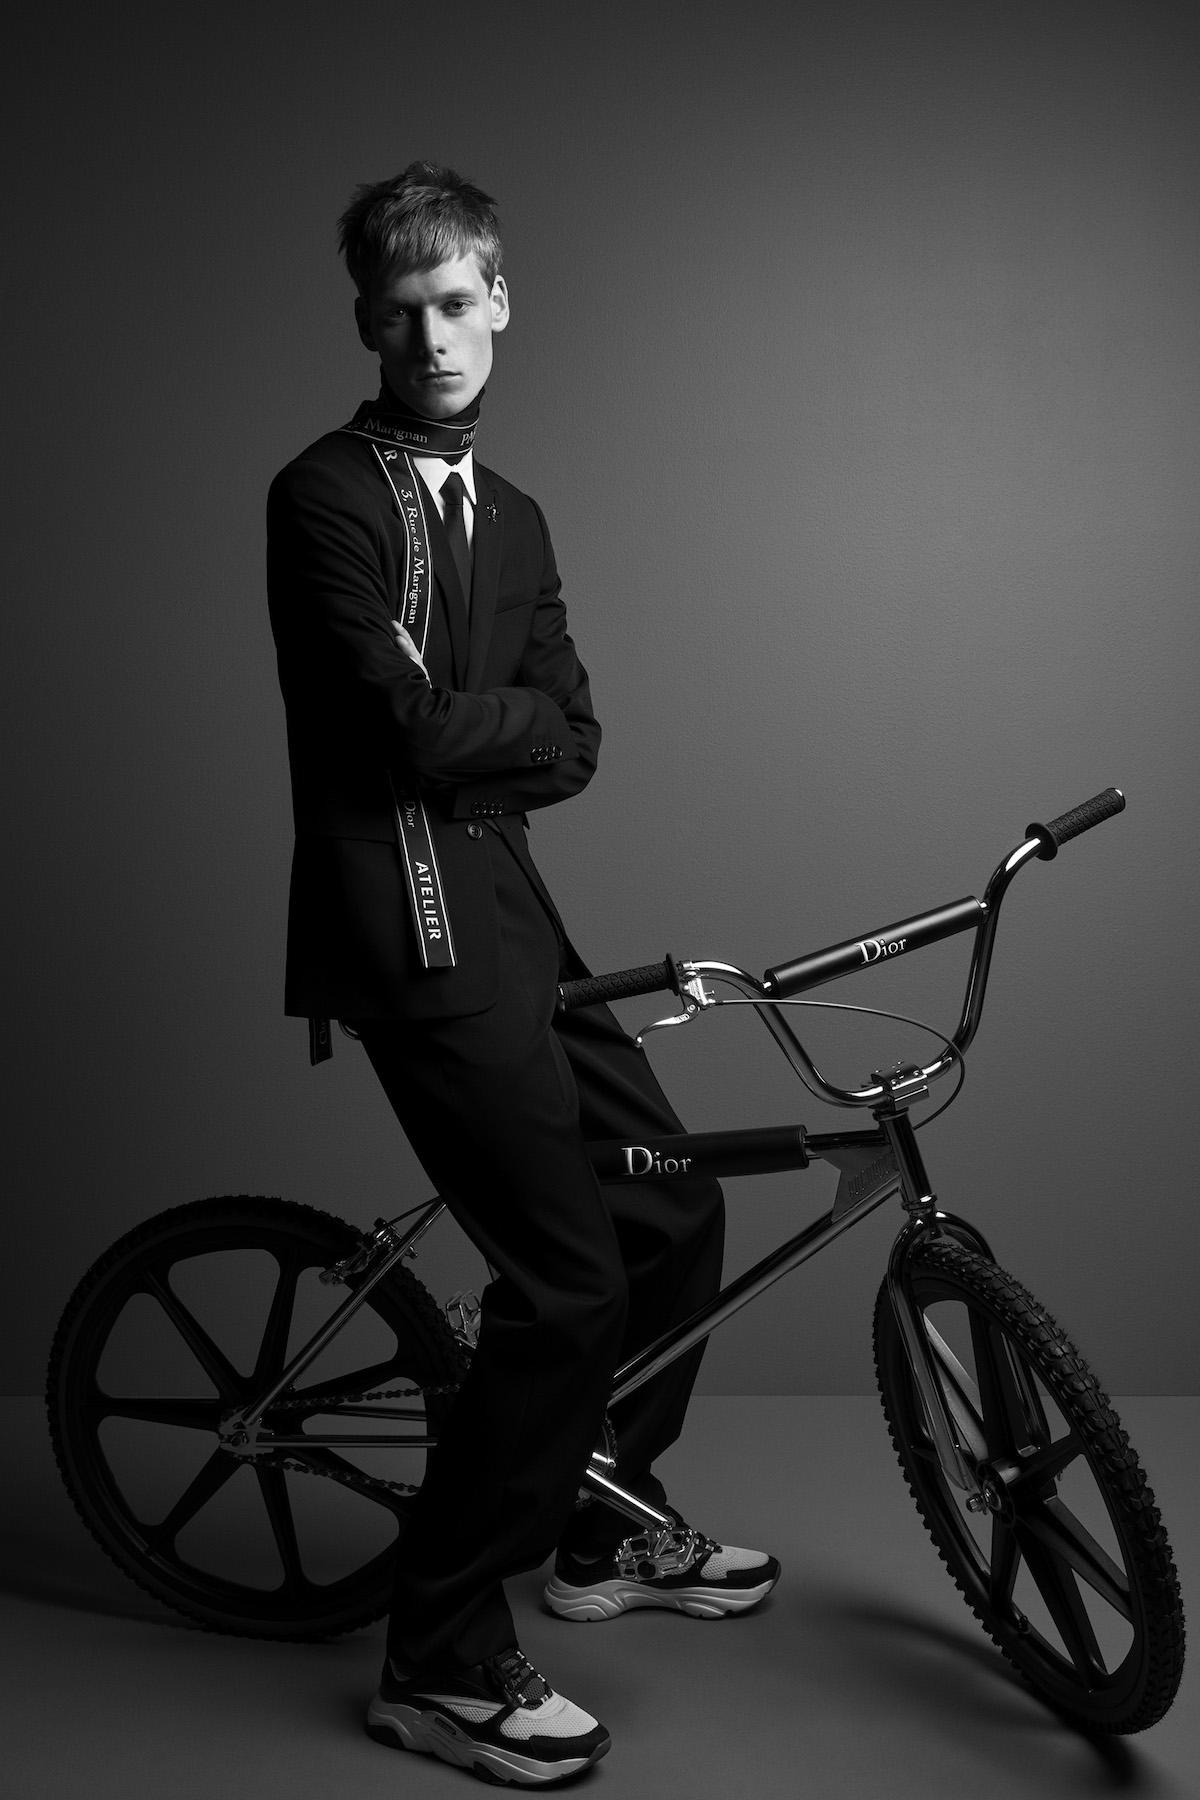 Dior Homme Reveals New Sneaker & Dior Homme Bike